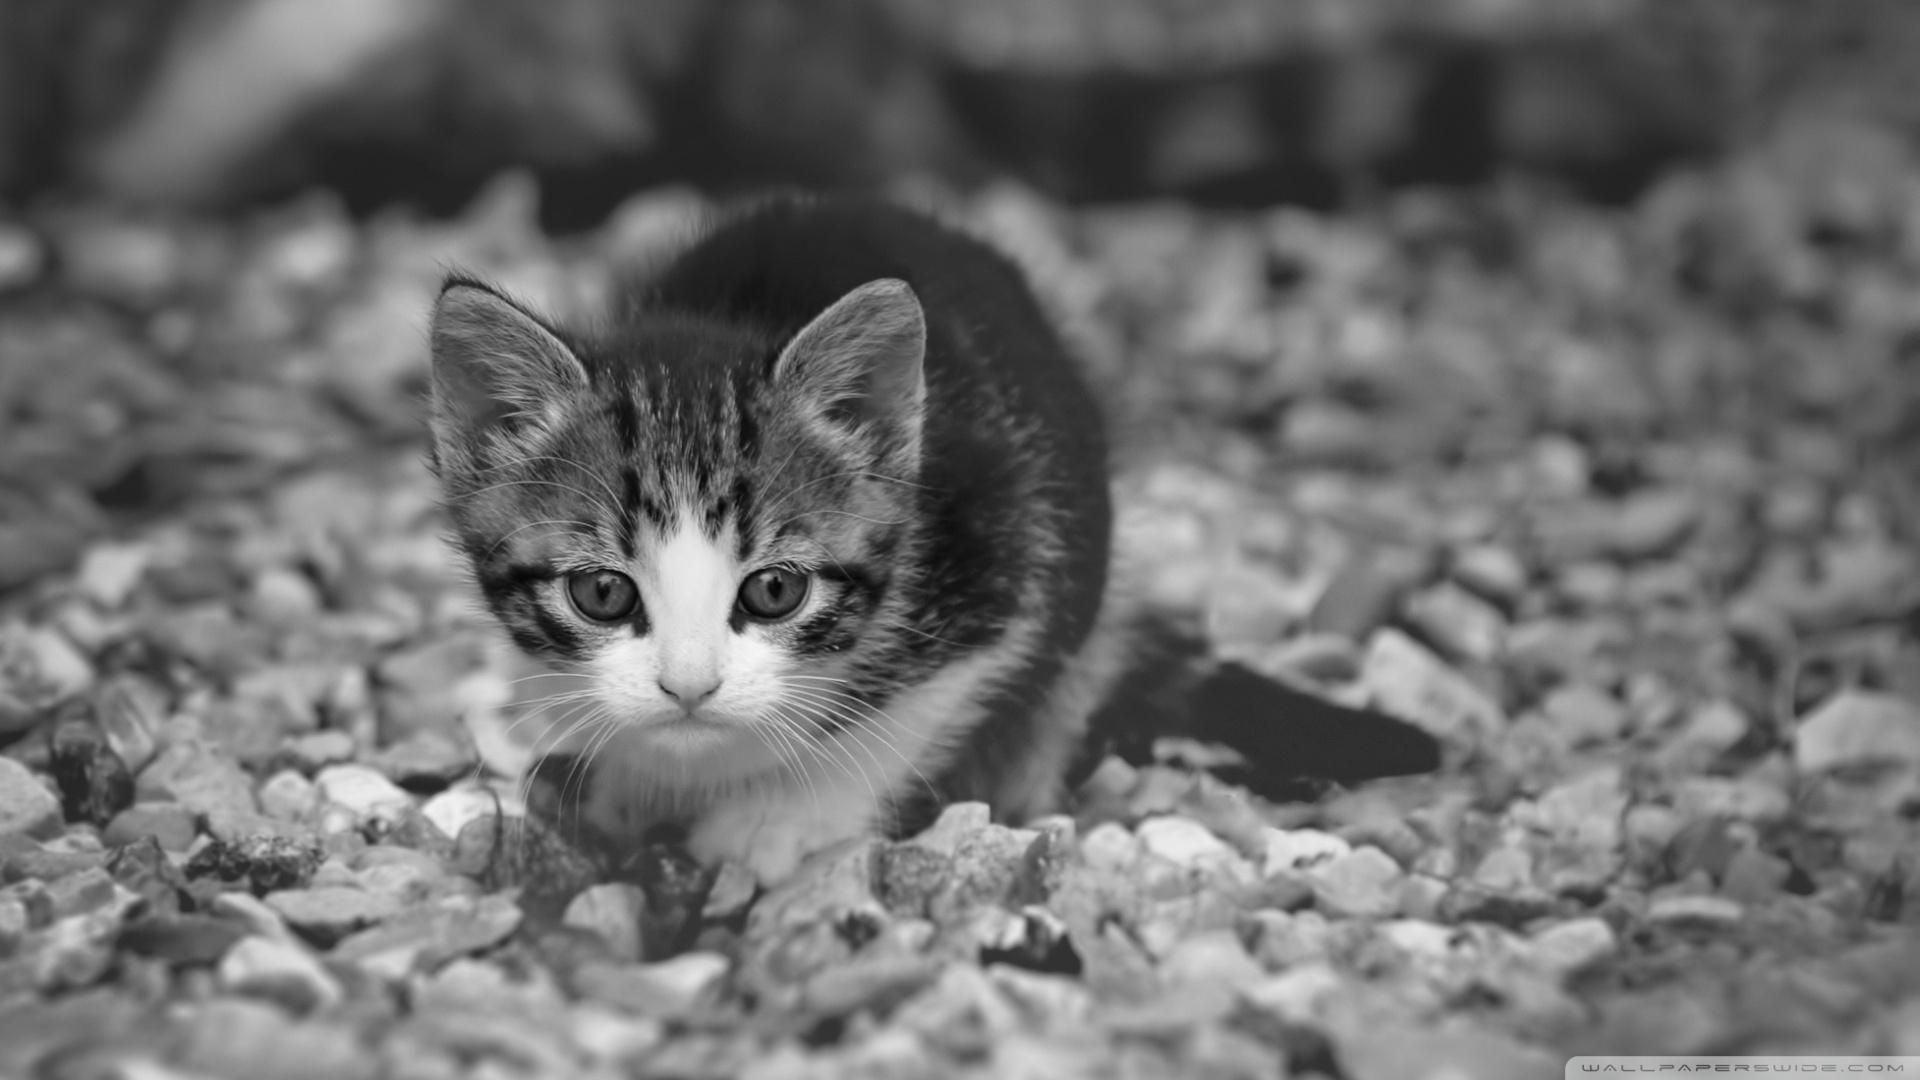 18 adorable kitty cat wallpapers - Kitten wallpaper ...